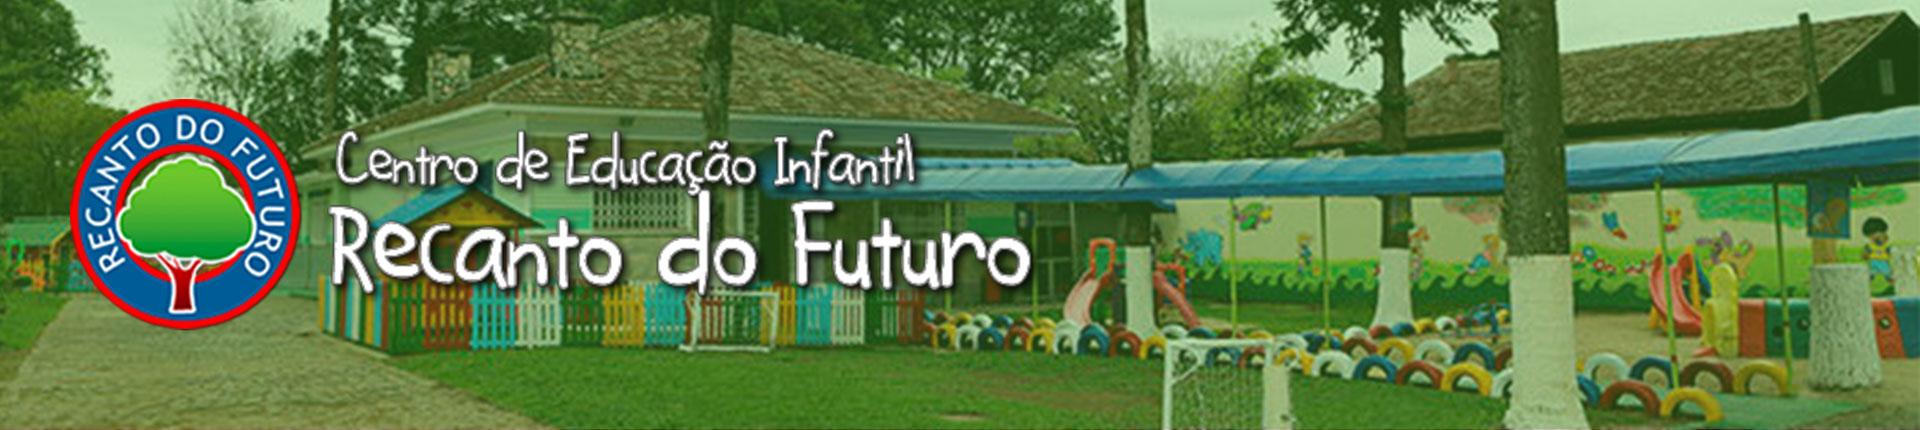 CEI Recanto do Futuro